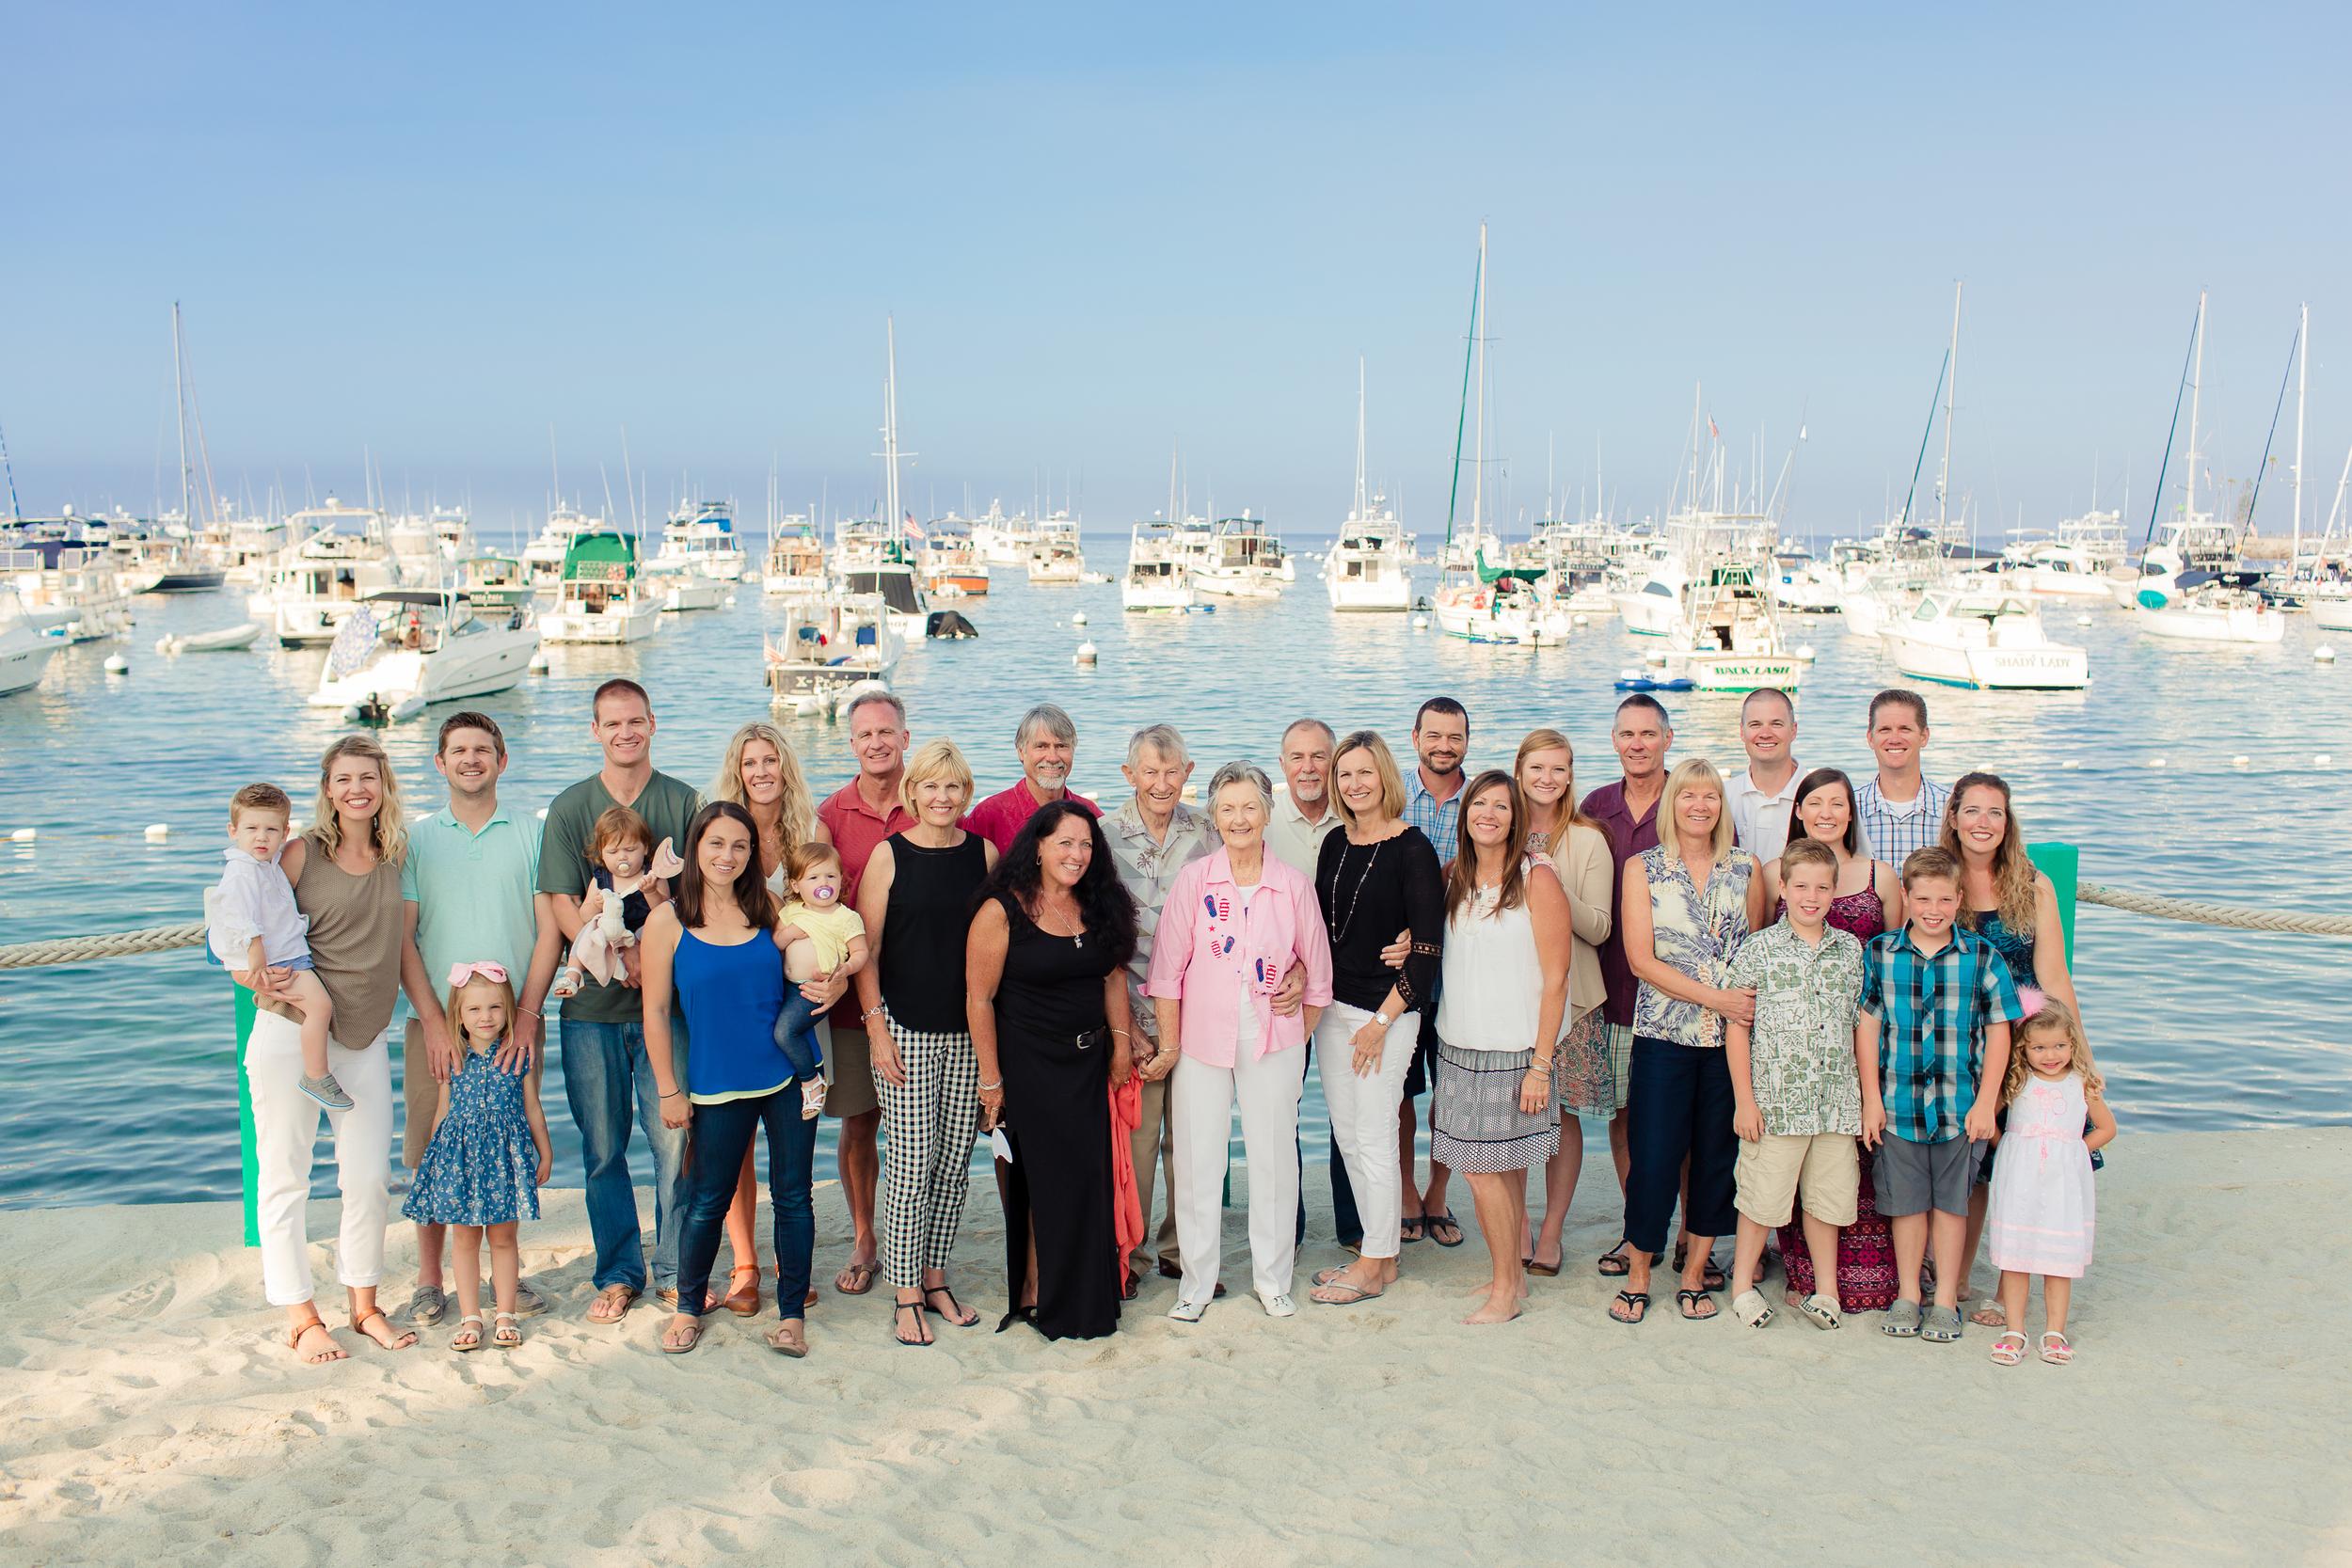 Hansen Family Gathering at Avalon - June 2015